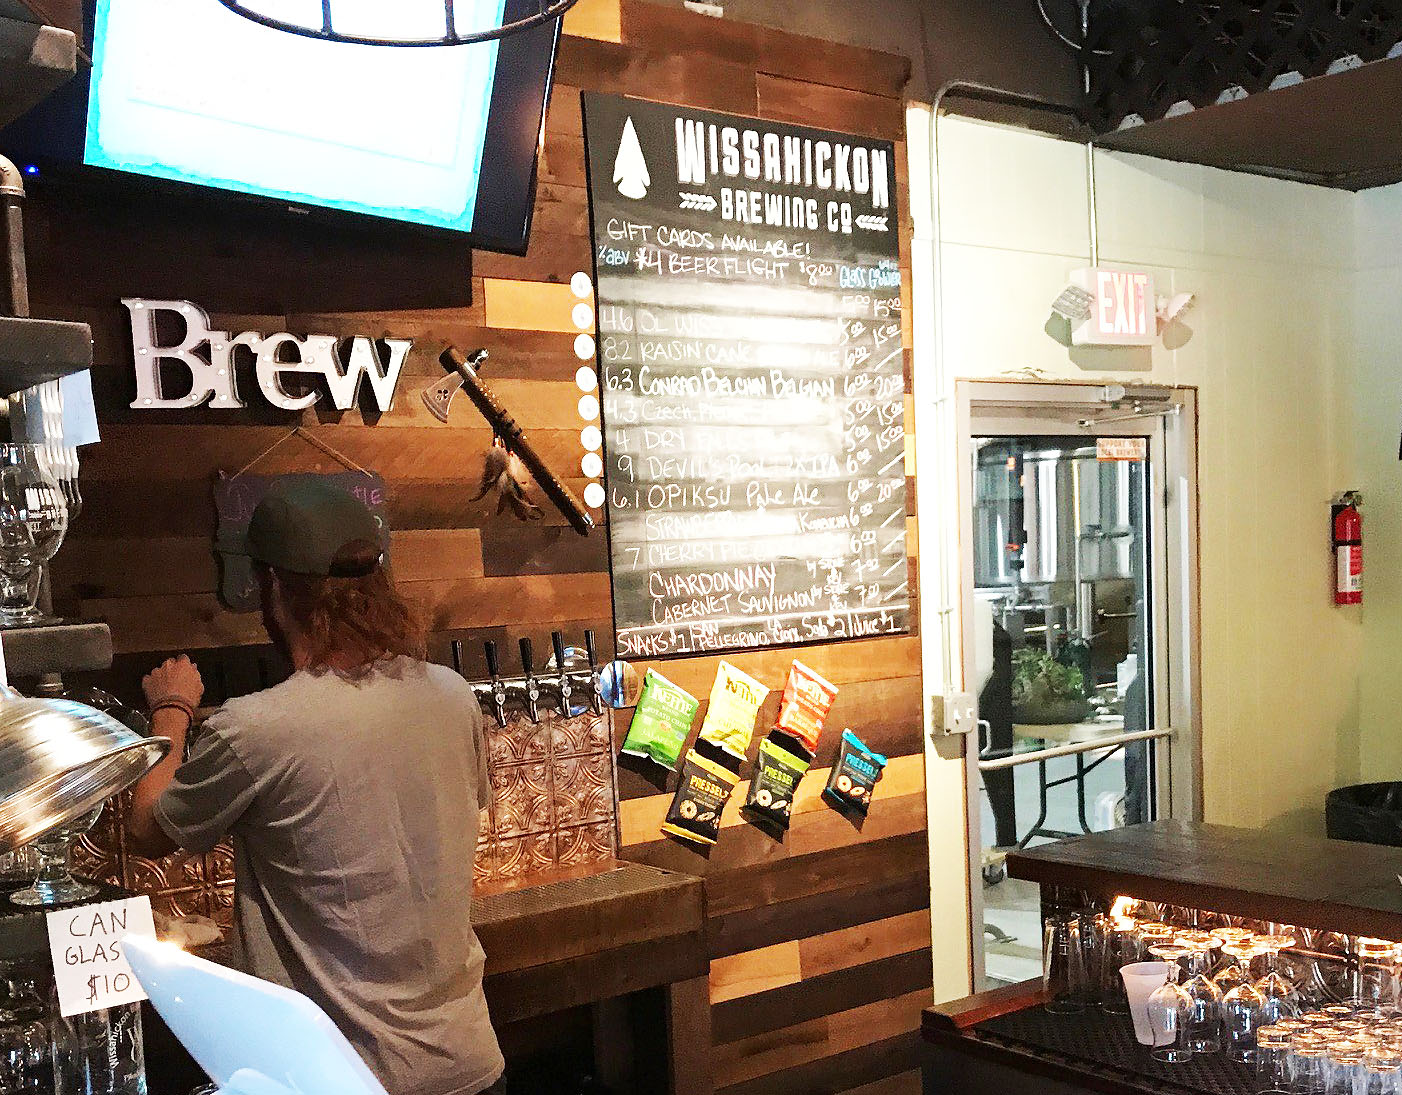 338. Wissahickon Brewing Co, Philadelphia PA, 2017